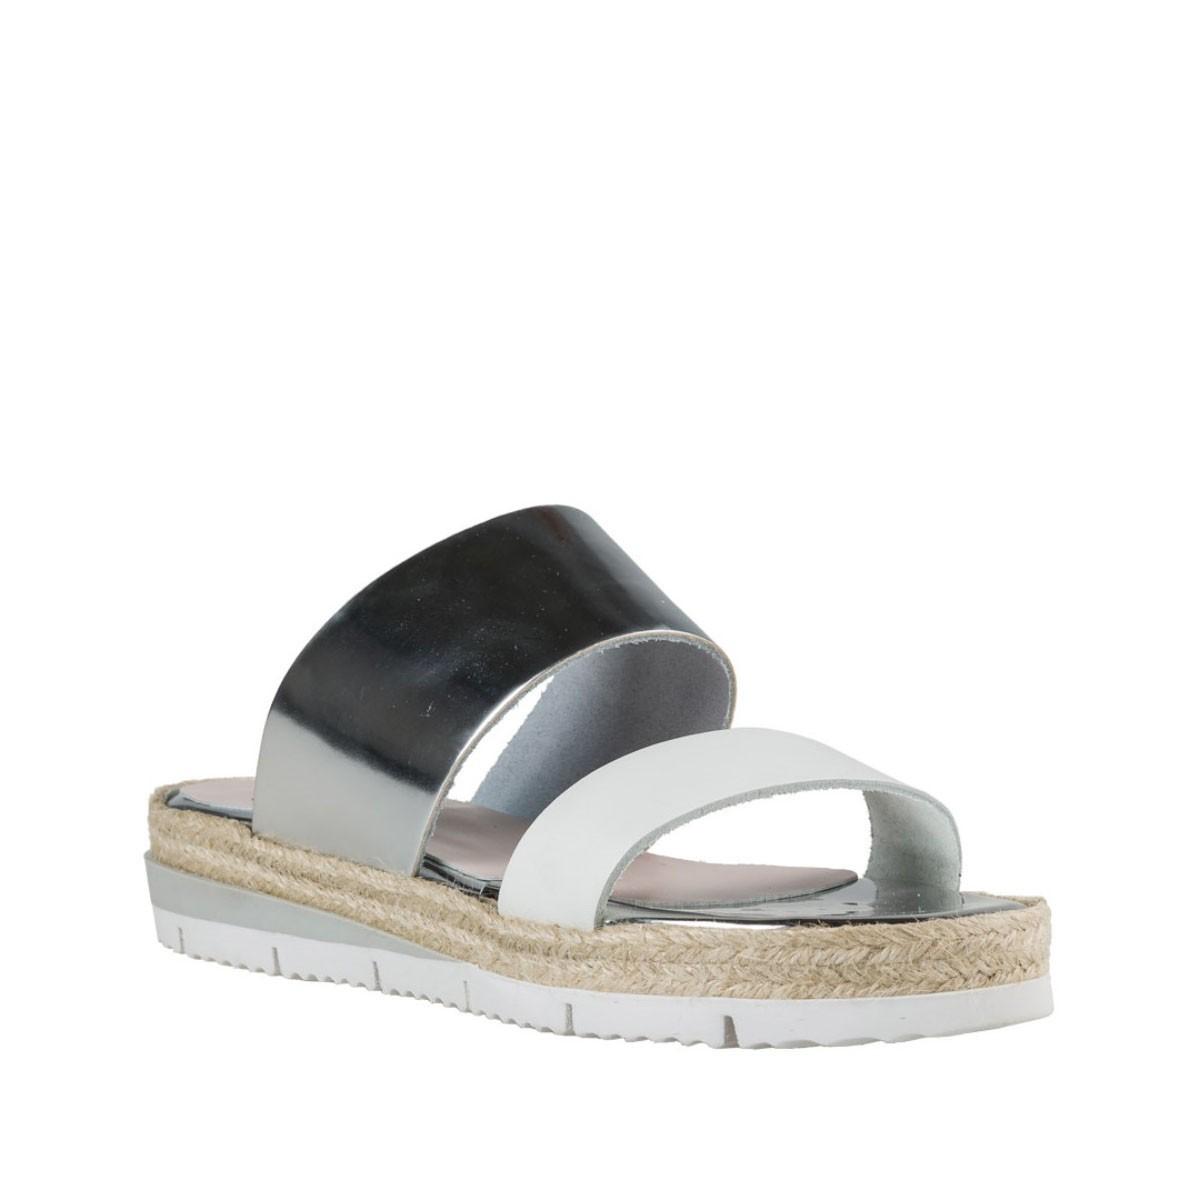 Mairiboo by Envie Shoes Γυναικείες Παντόφλες M03-05913 Άσπρο Mairiboo M03-05913 Άσπρο